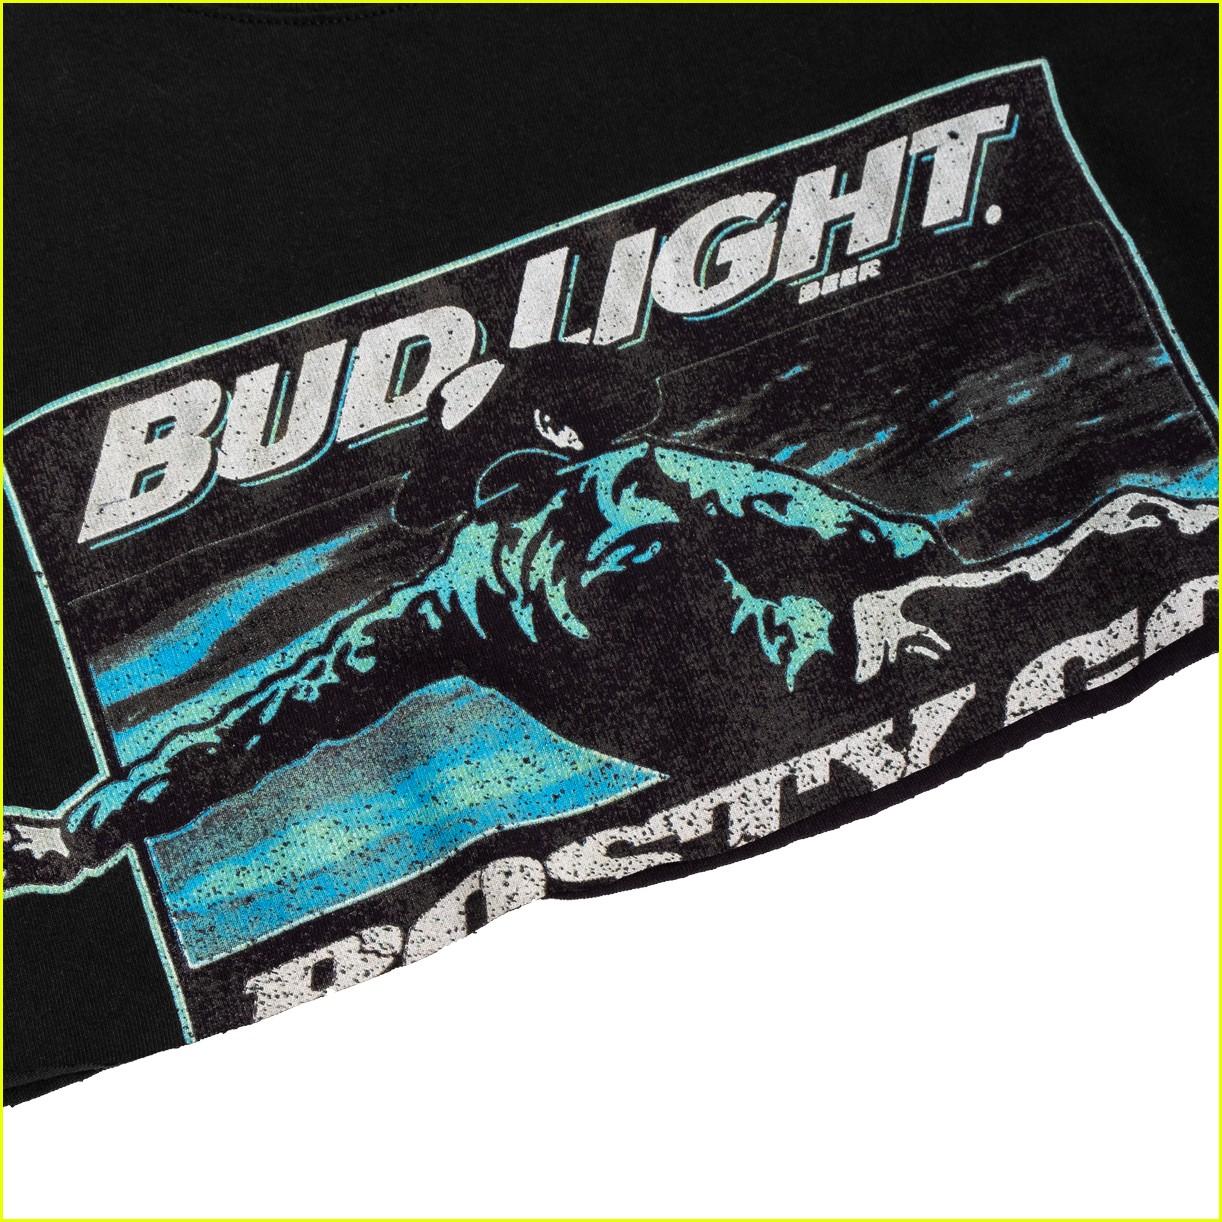 post malone bud light collab 15